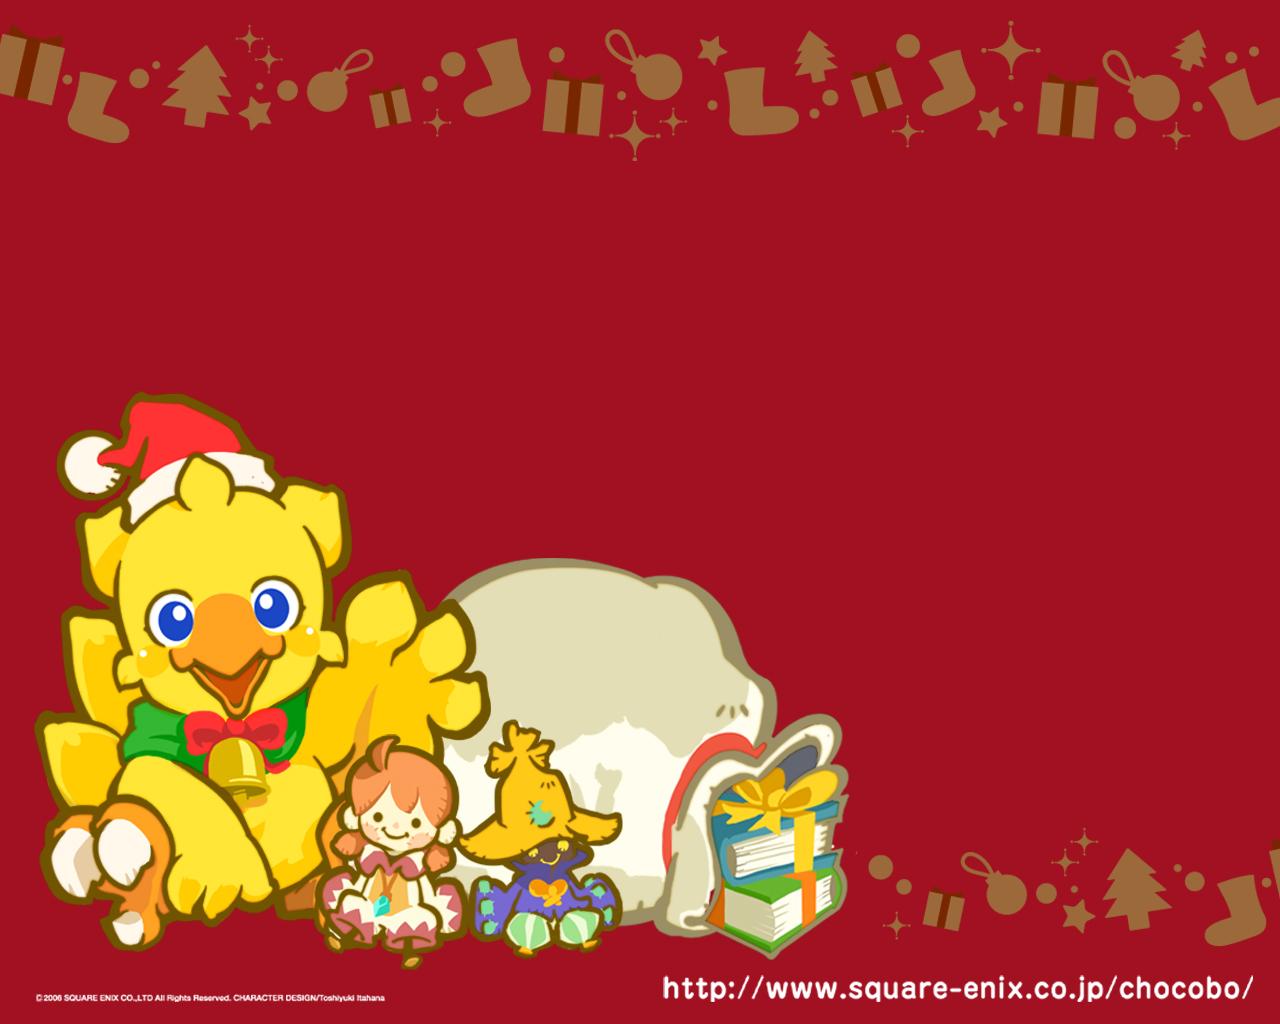 Final Fantasy Christmas Wallpaper